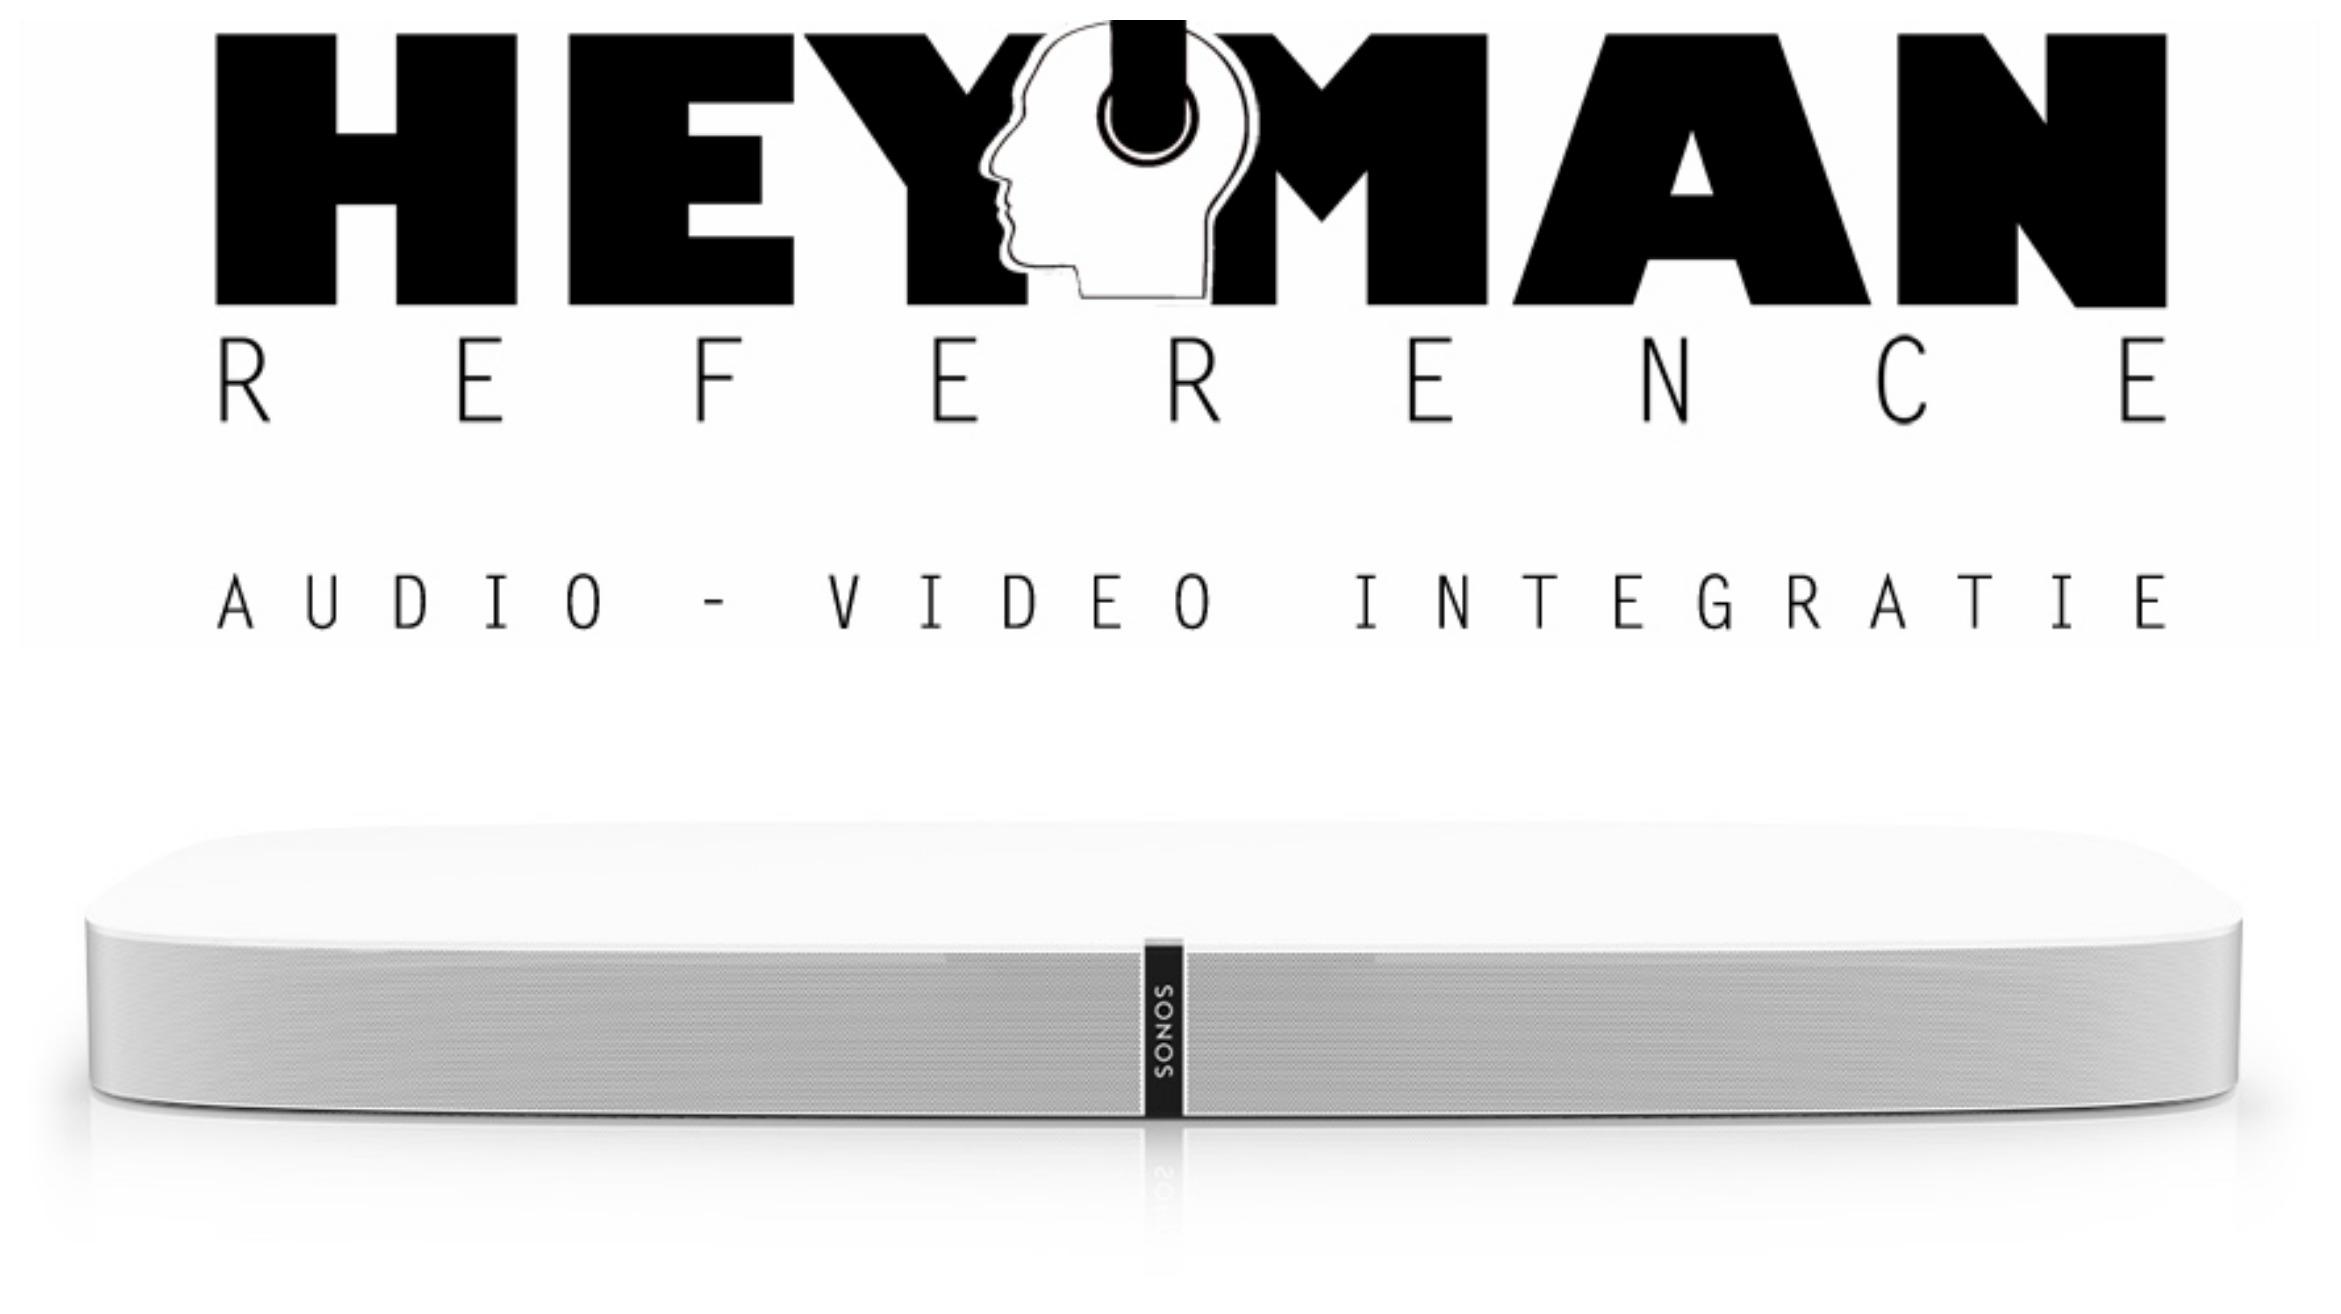 heyman reference sonos playbase demo